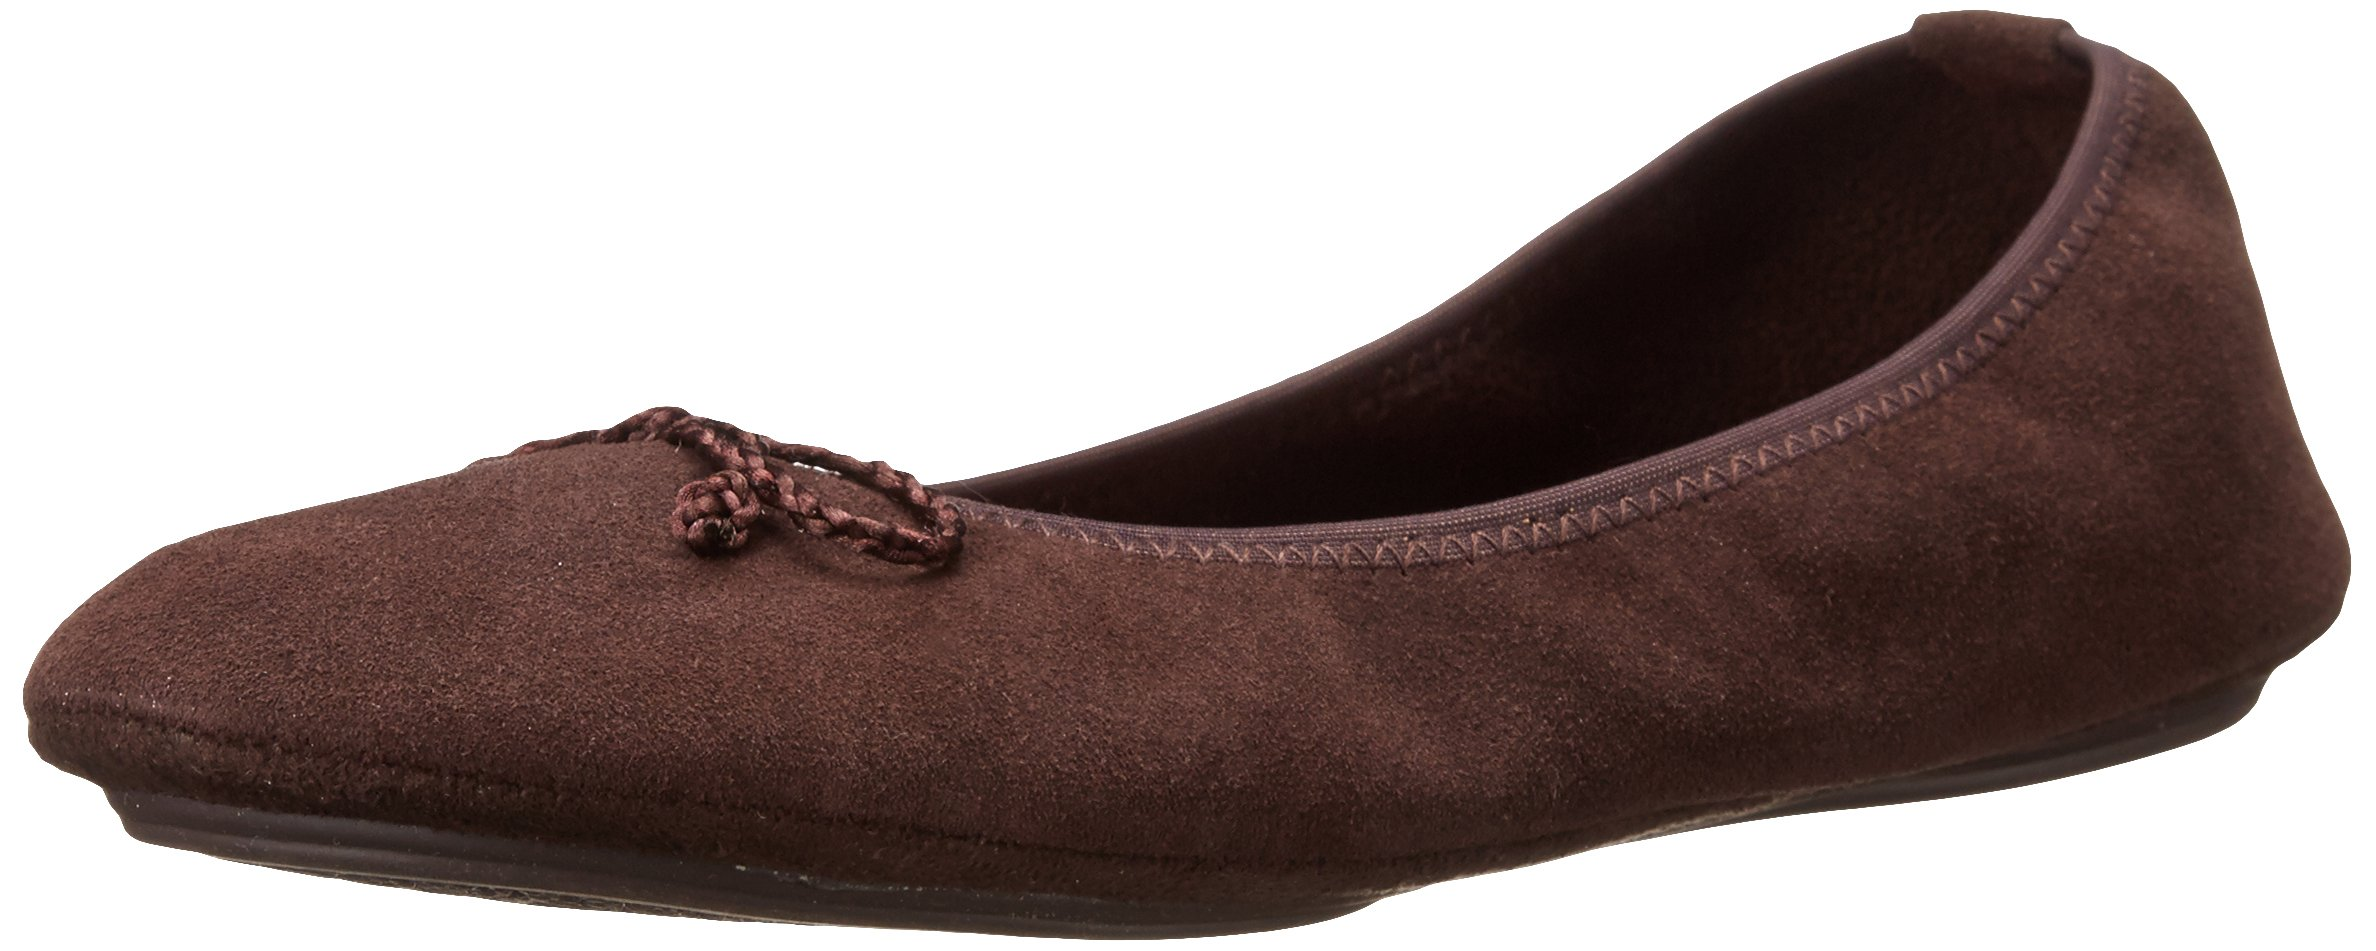 Hush Puppies 女士 Lilac 芭蕾平底鞋